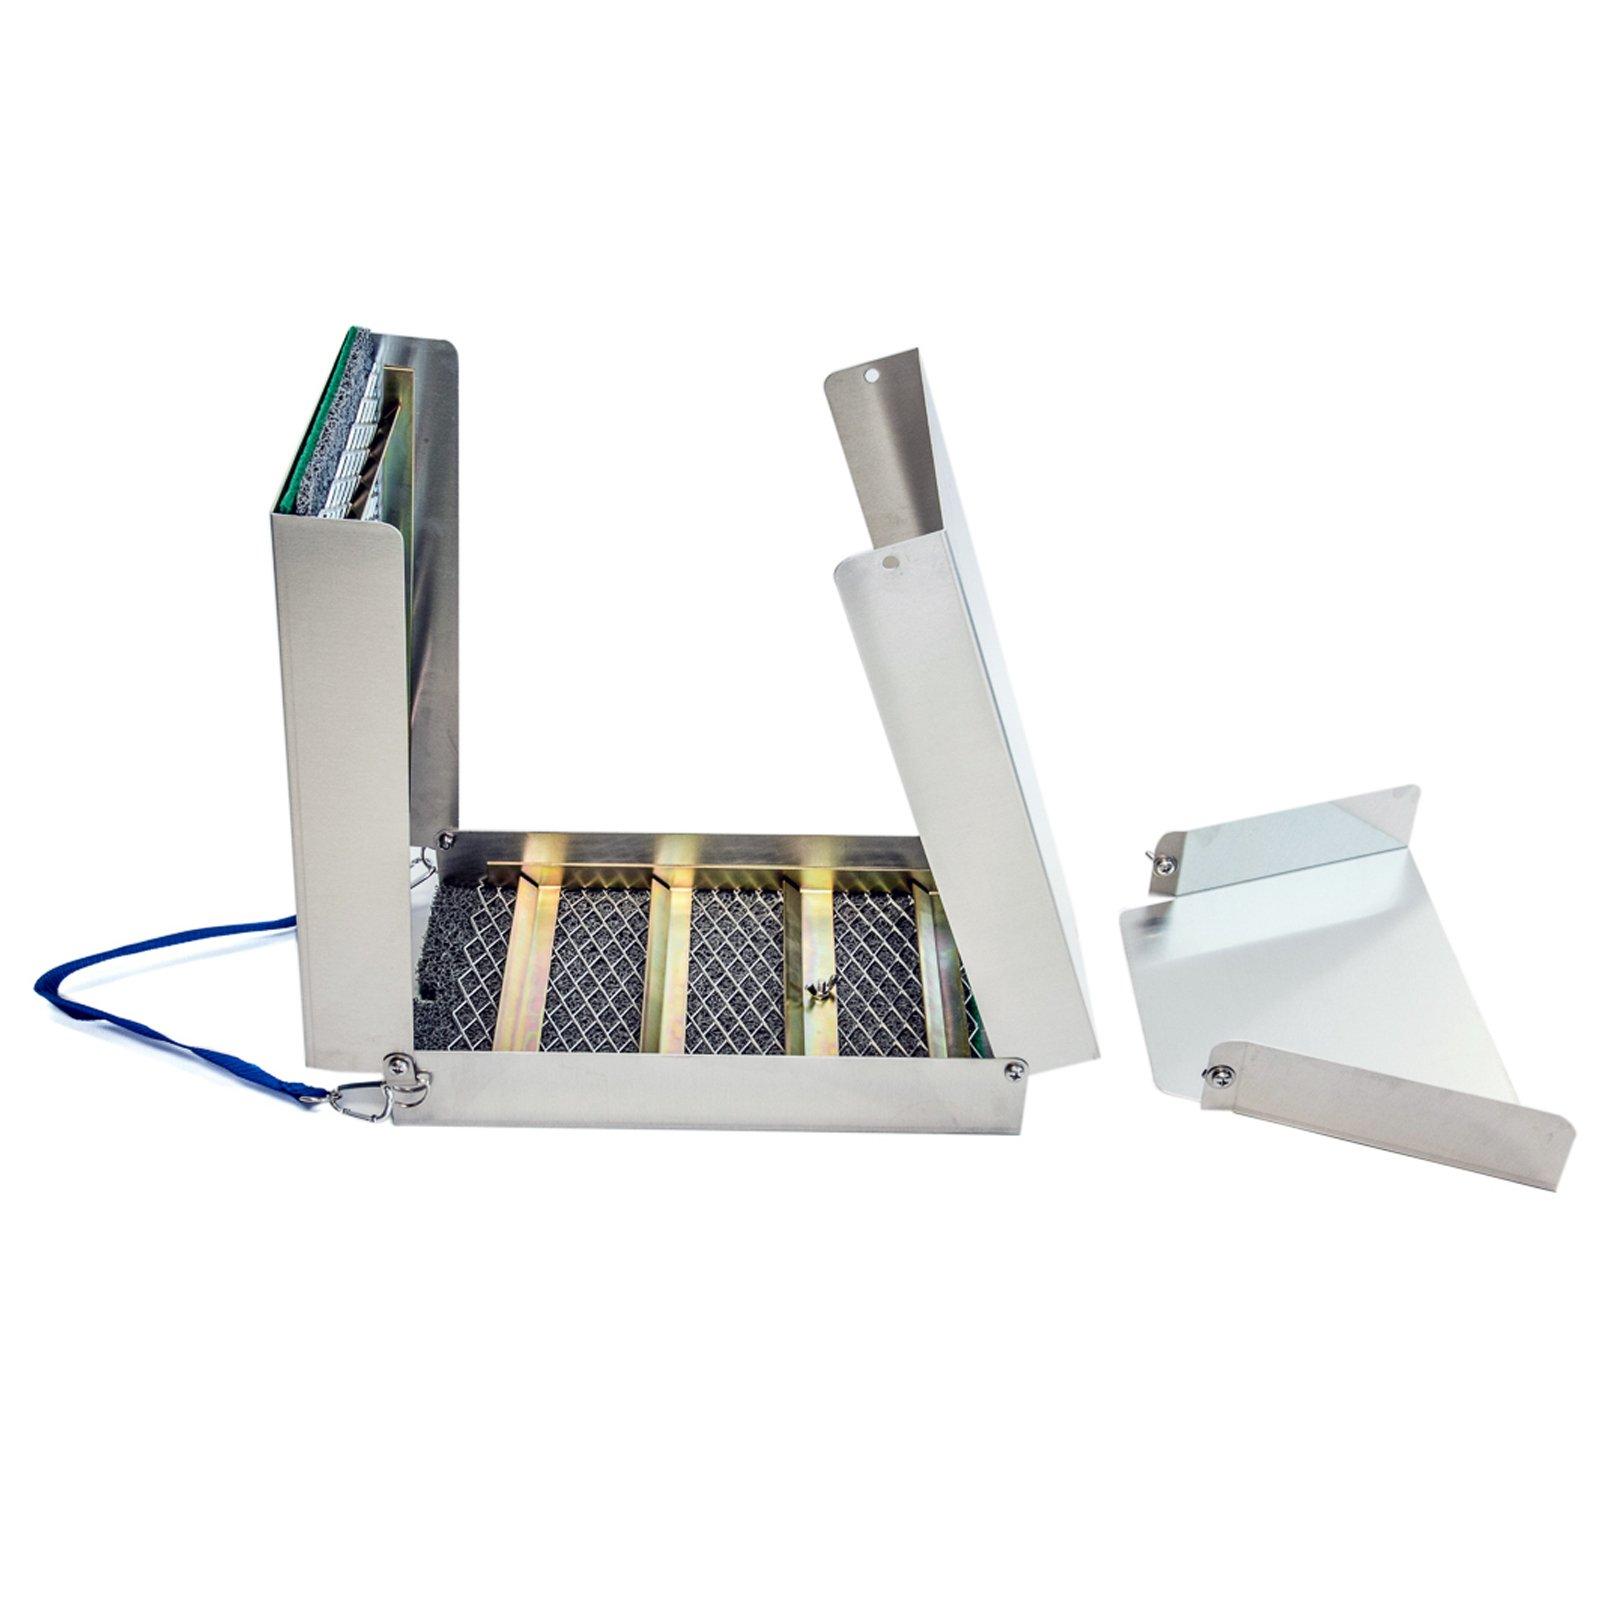 ASR Outdoor Gold Sluice Box Folding Aluminum Portable Gold Prospecting, 50 Inch